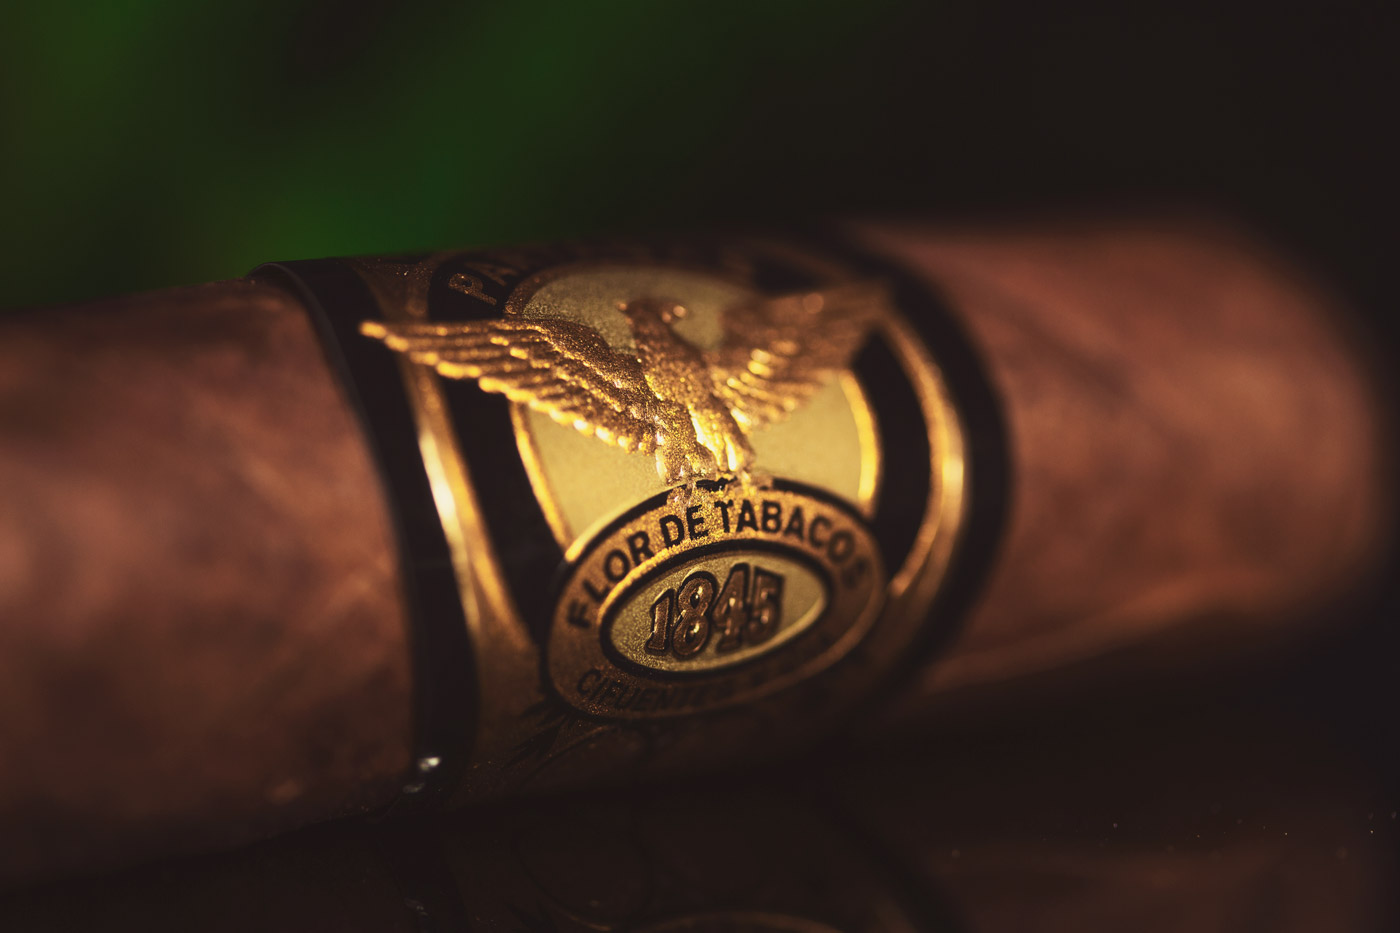 Partagas 1845 Clasico robusto cigar review